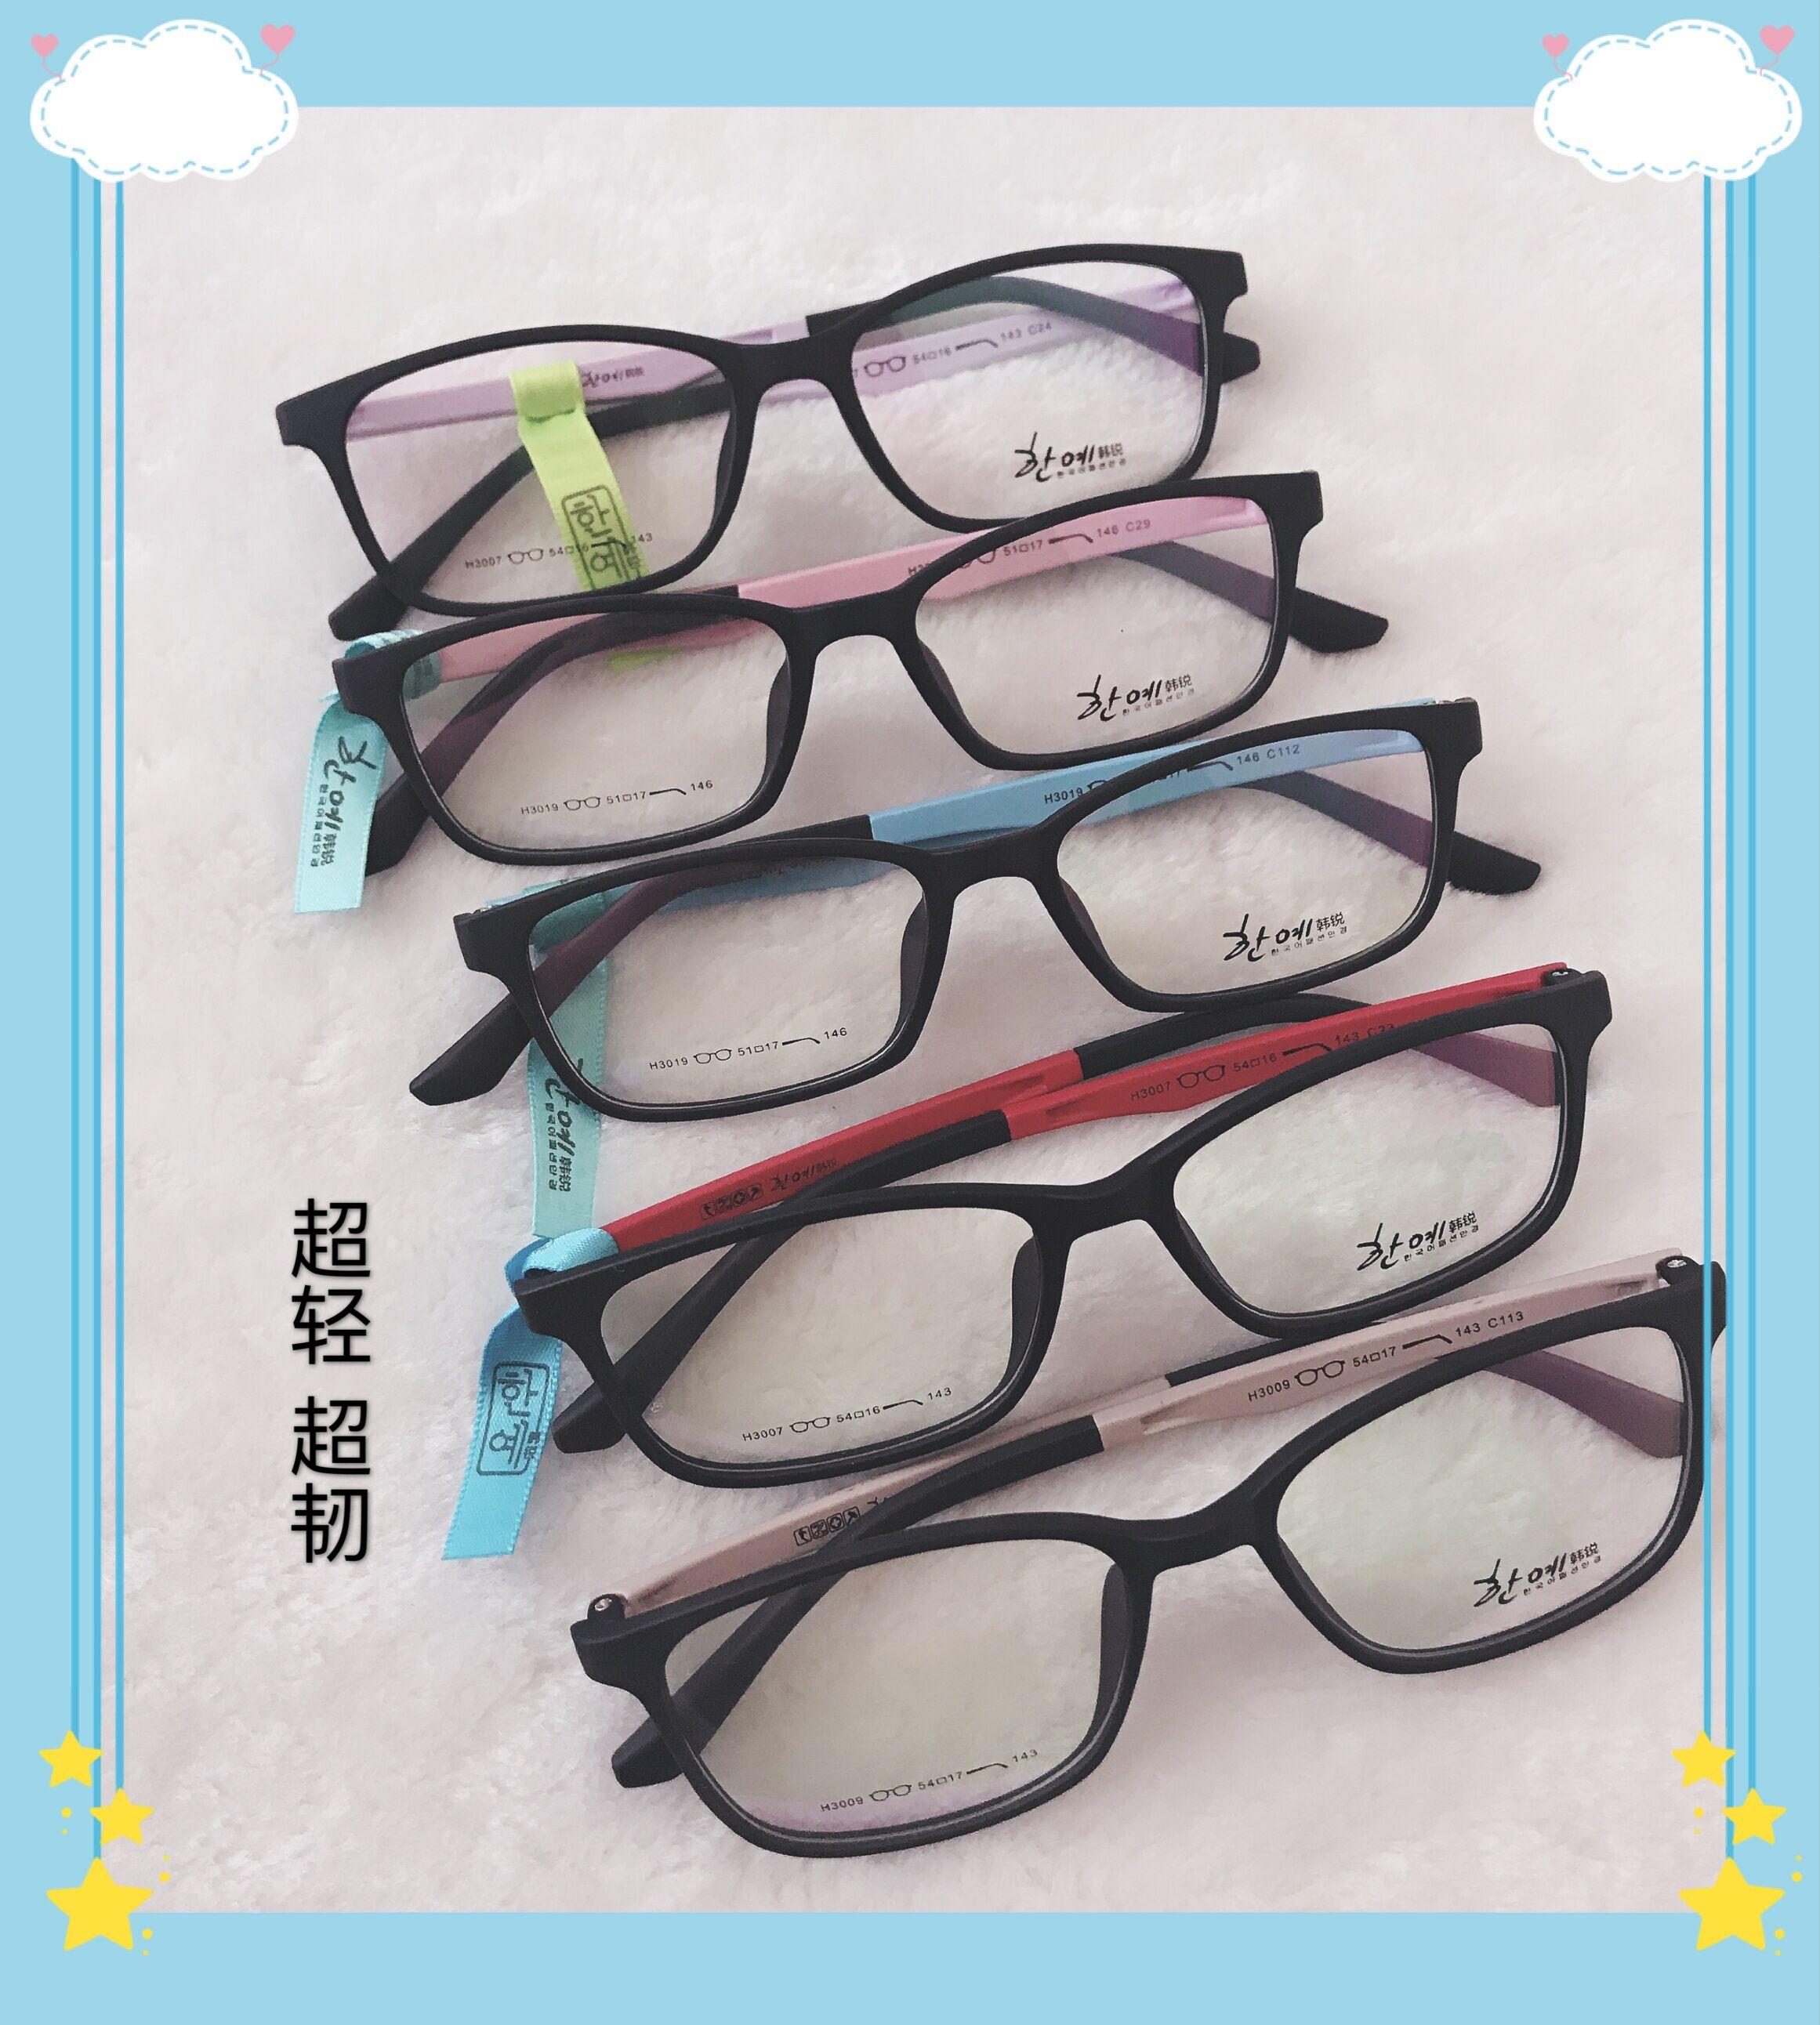 Han Rui classic leisure full frame fashion color matching glasses legs men and womens myopia glasses